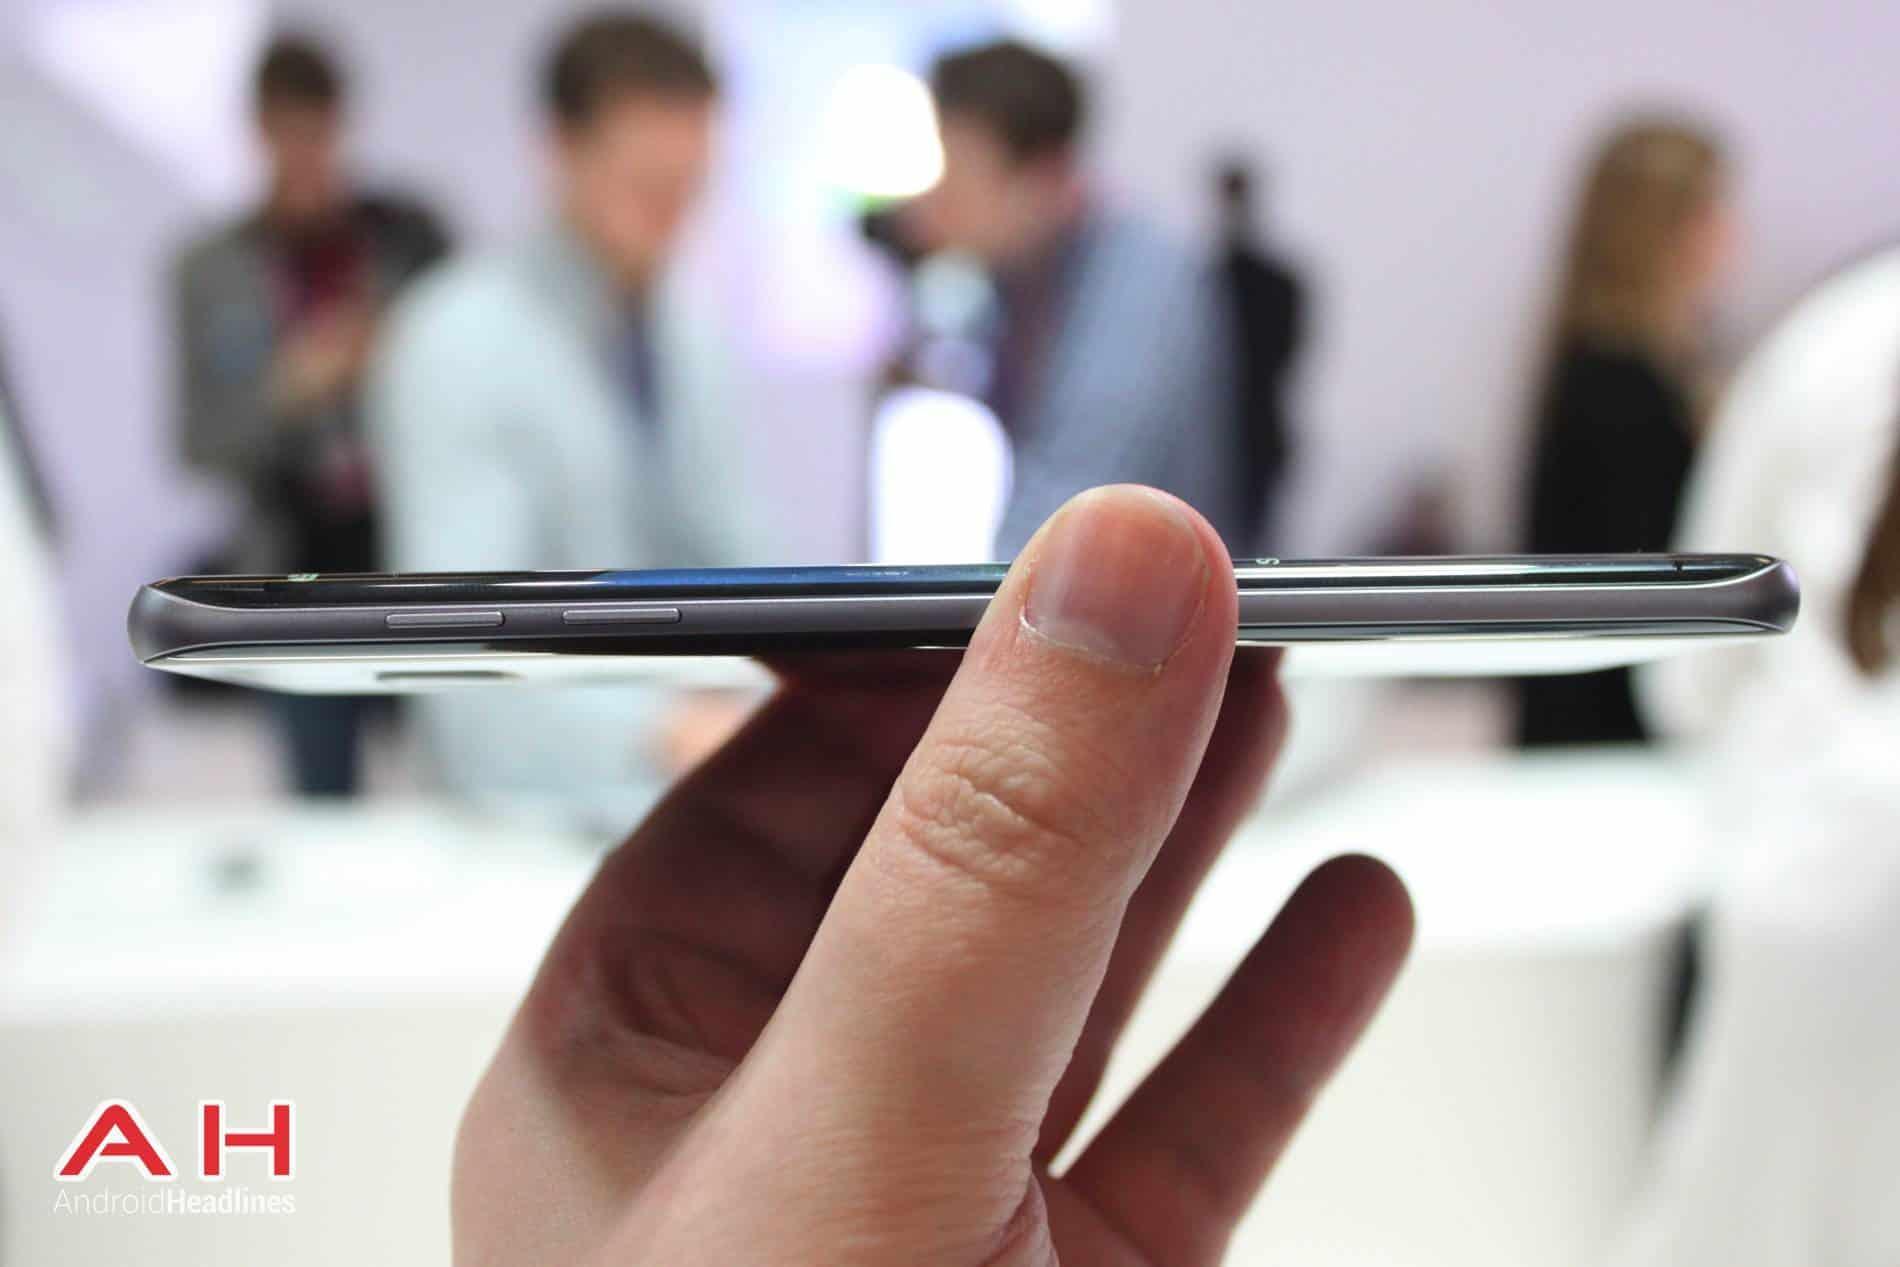 Galaxy S7 Edge MWC AH 13